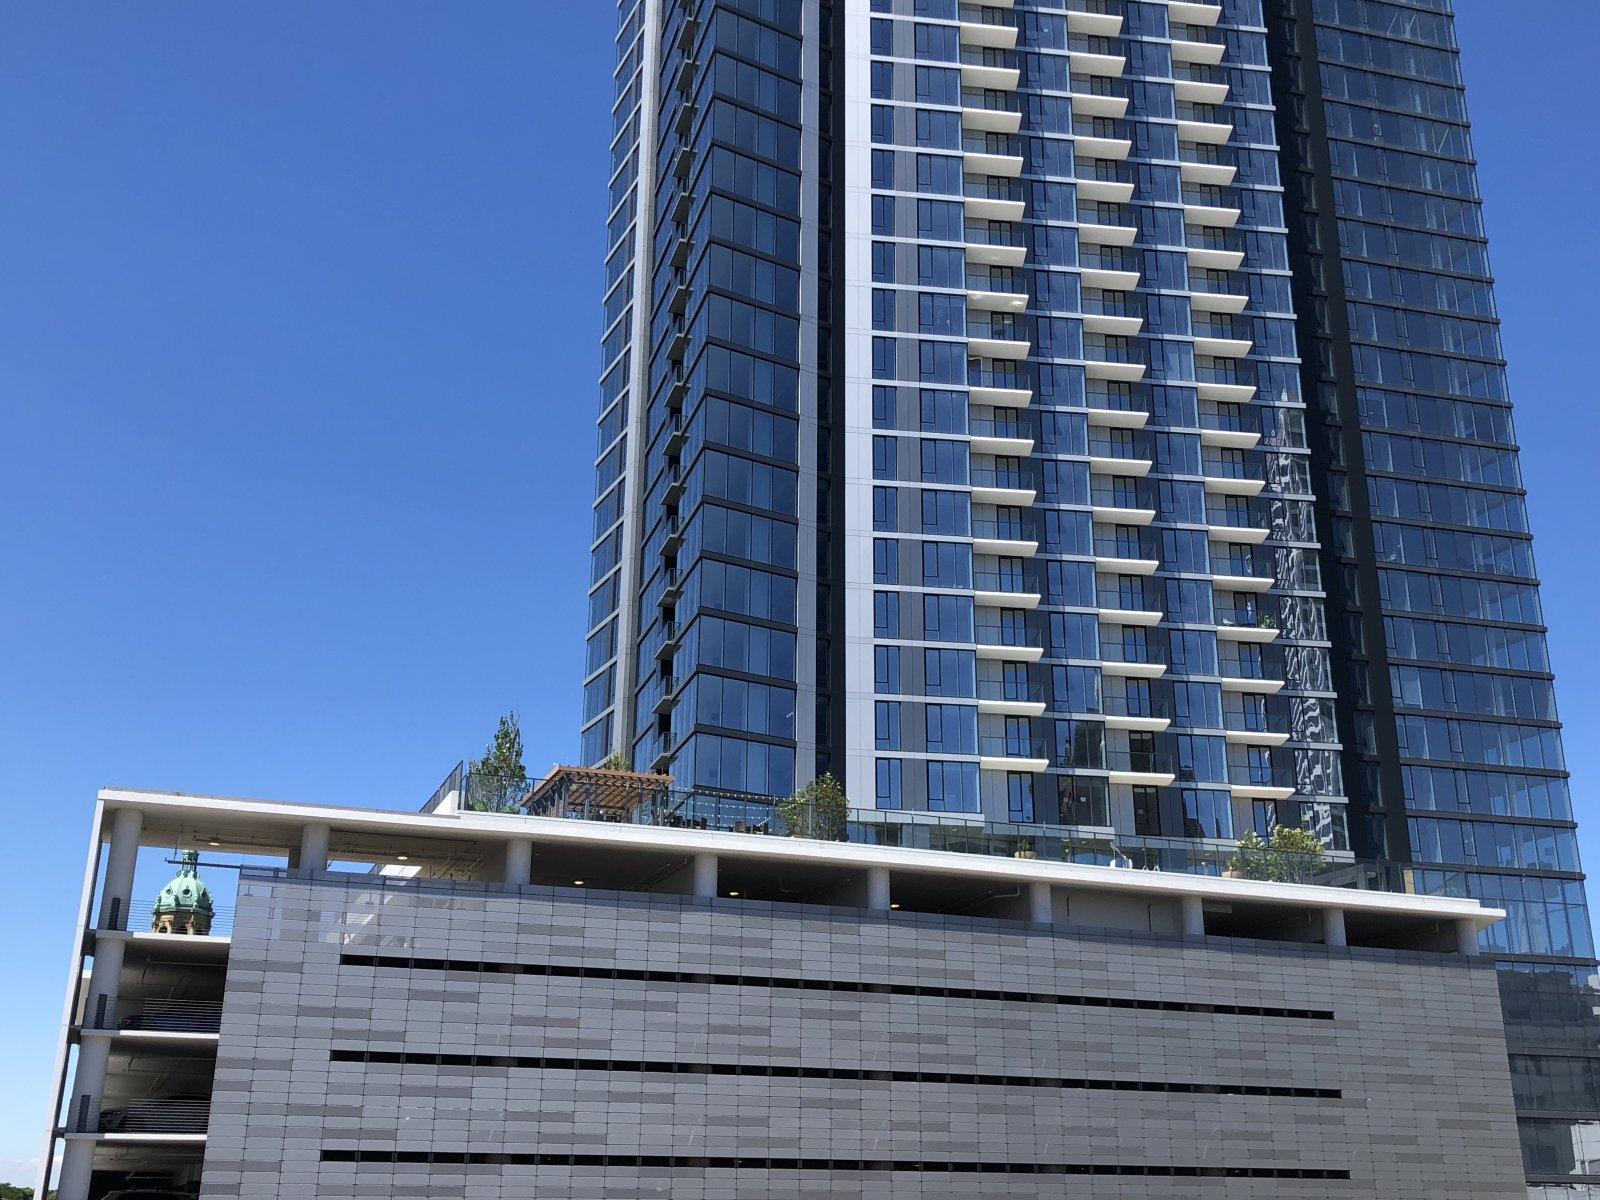 7Seventy7 Apartment Tower